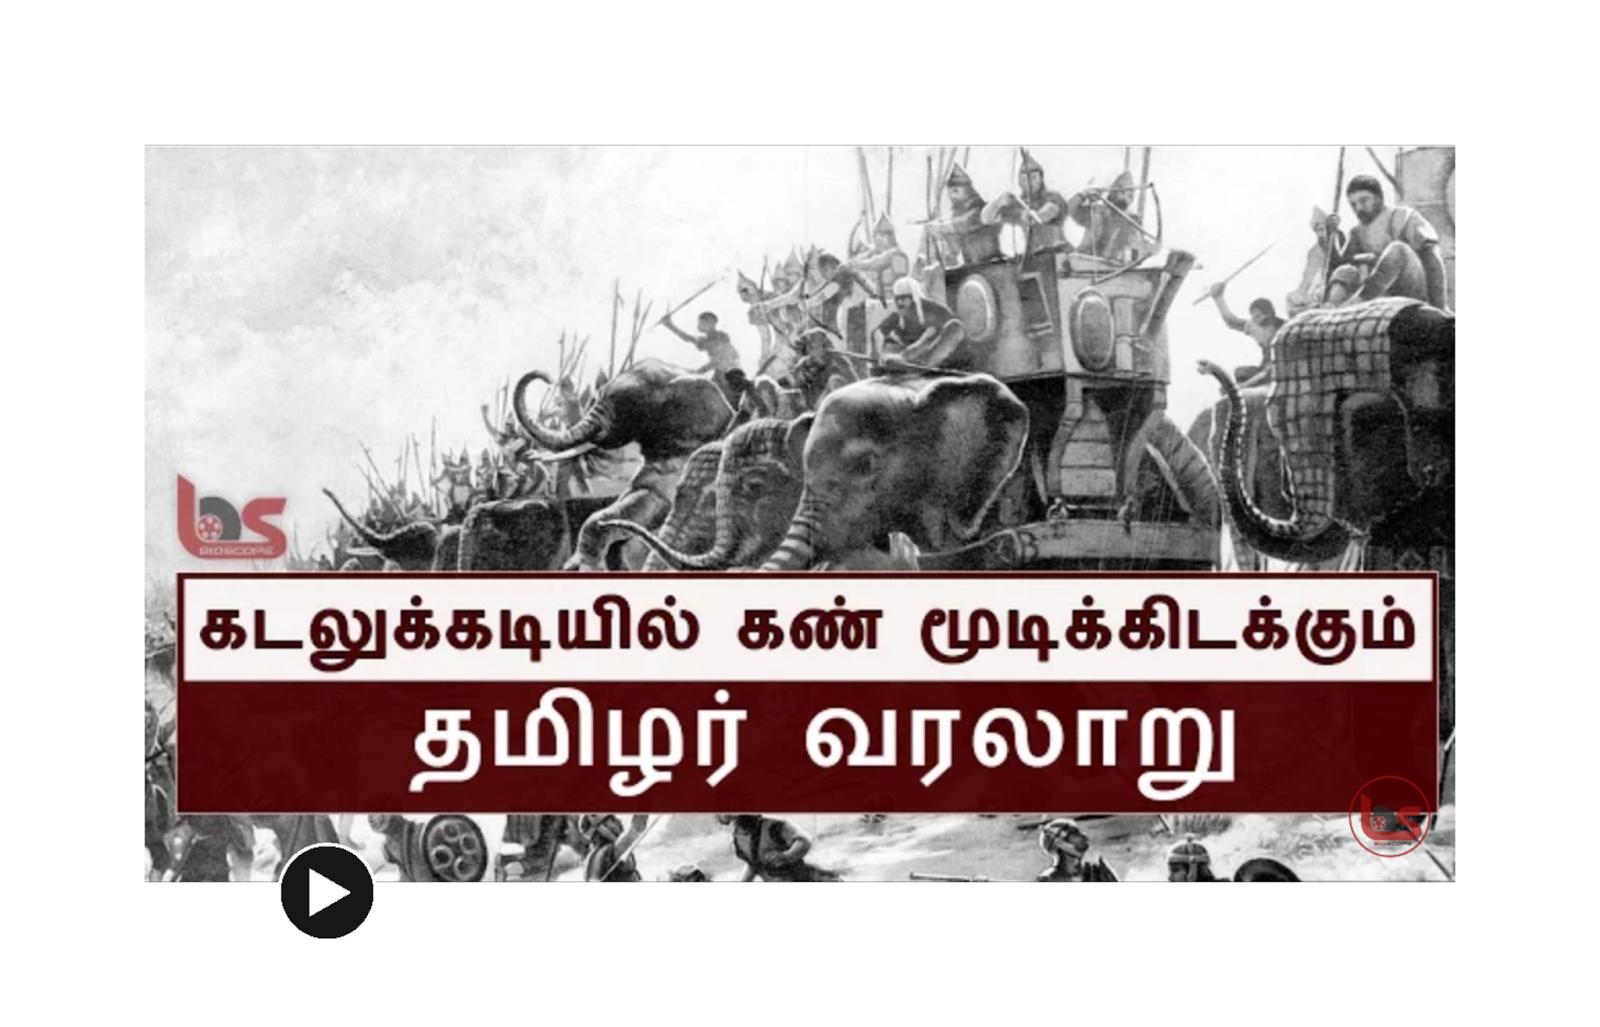 Kavery pombattinam tamil history tamil latest video - TAMIL SUN